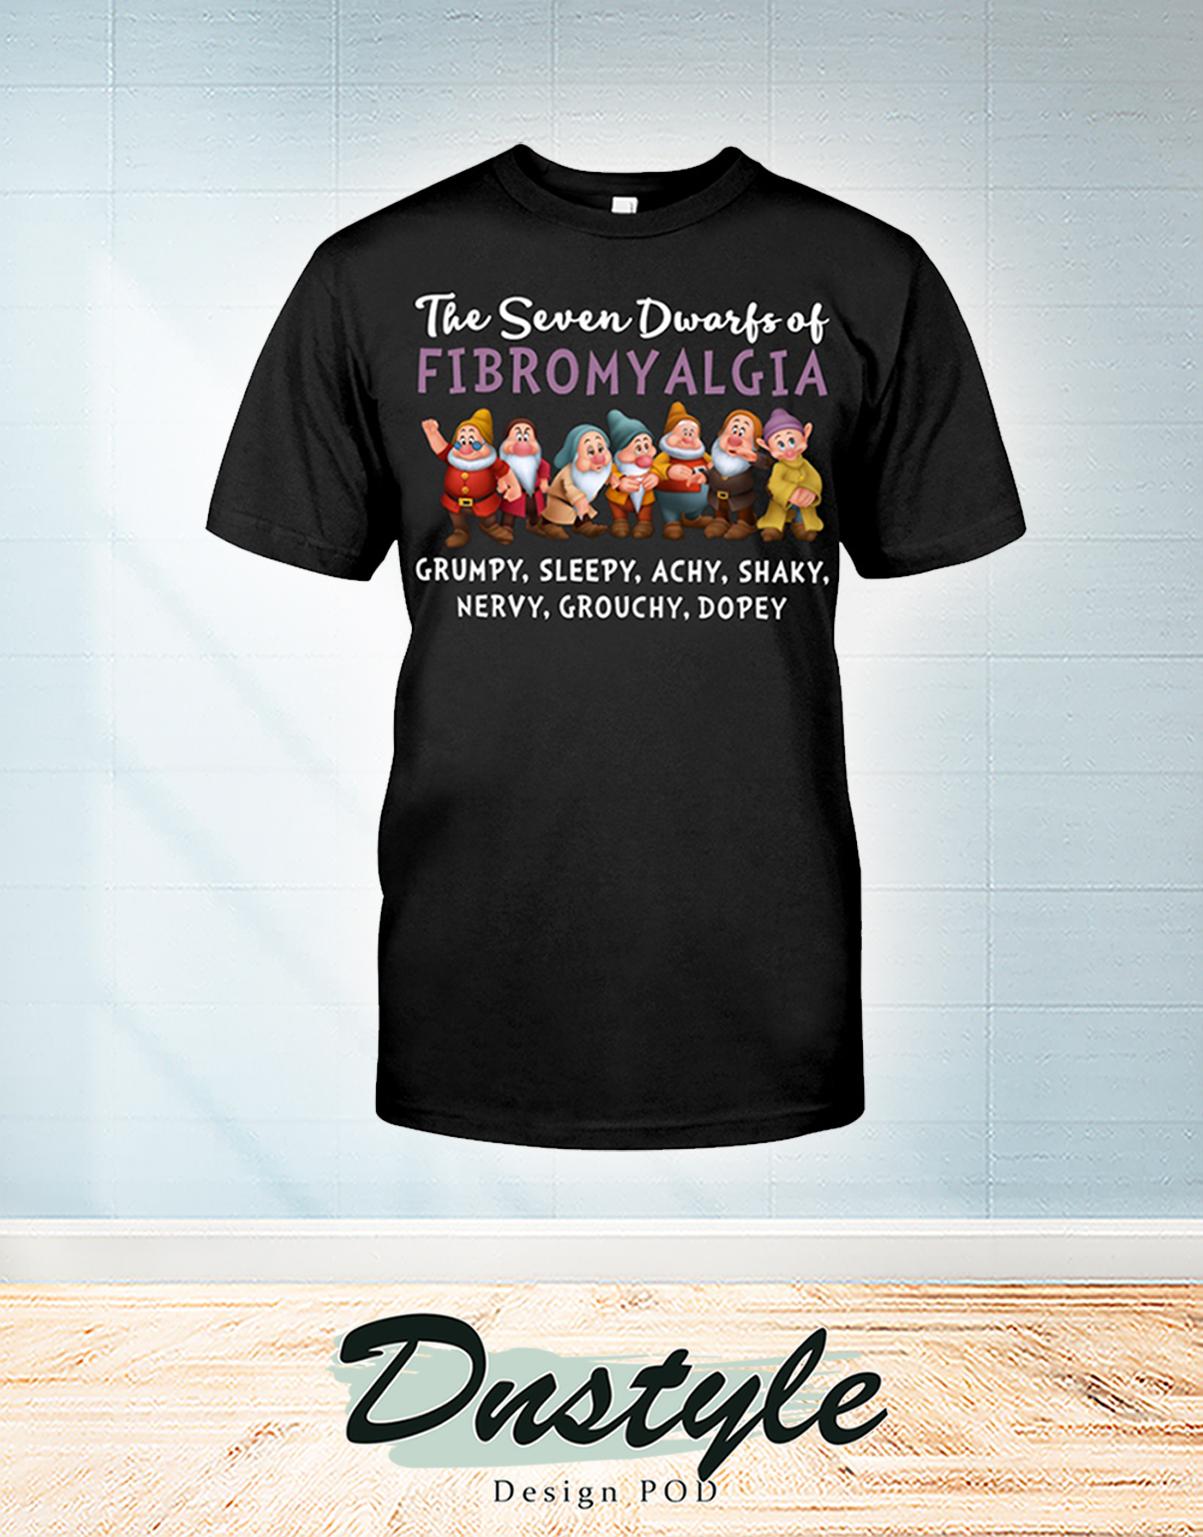 The seven dwarfs of fibromyalgia shirt